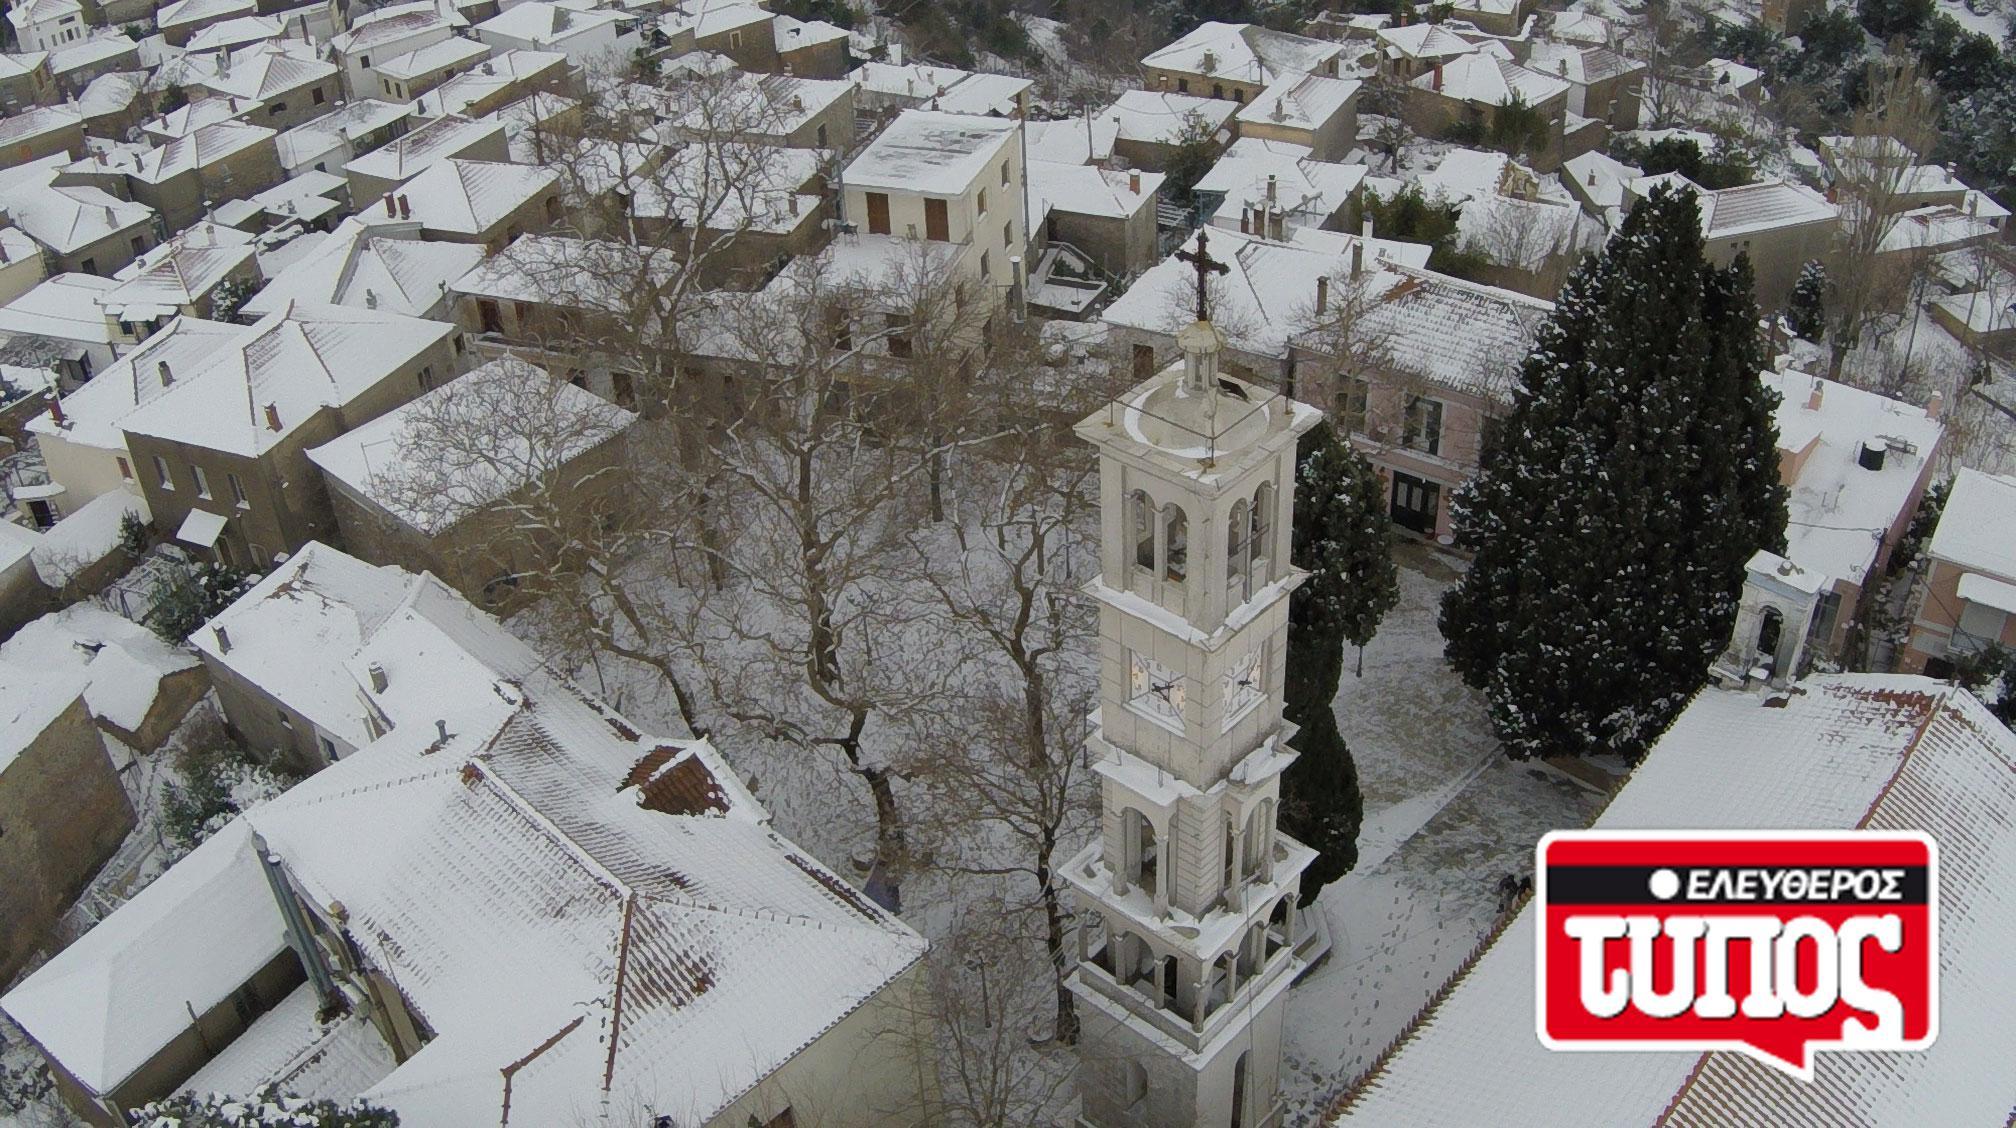 laukos-piliou-xionismenos-aerofotografies-1300-9 Εντυπωσιακές αεροφωτογραφίες από το χιονισμένο Λαύκο Πηλίου [εικόνες]